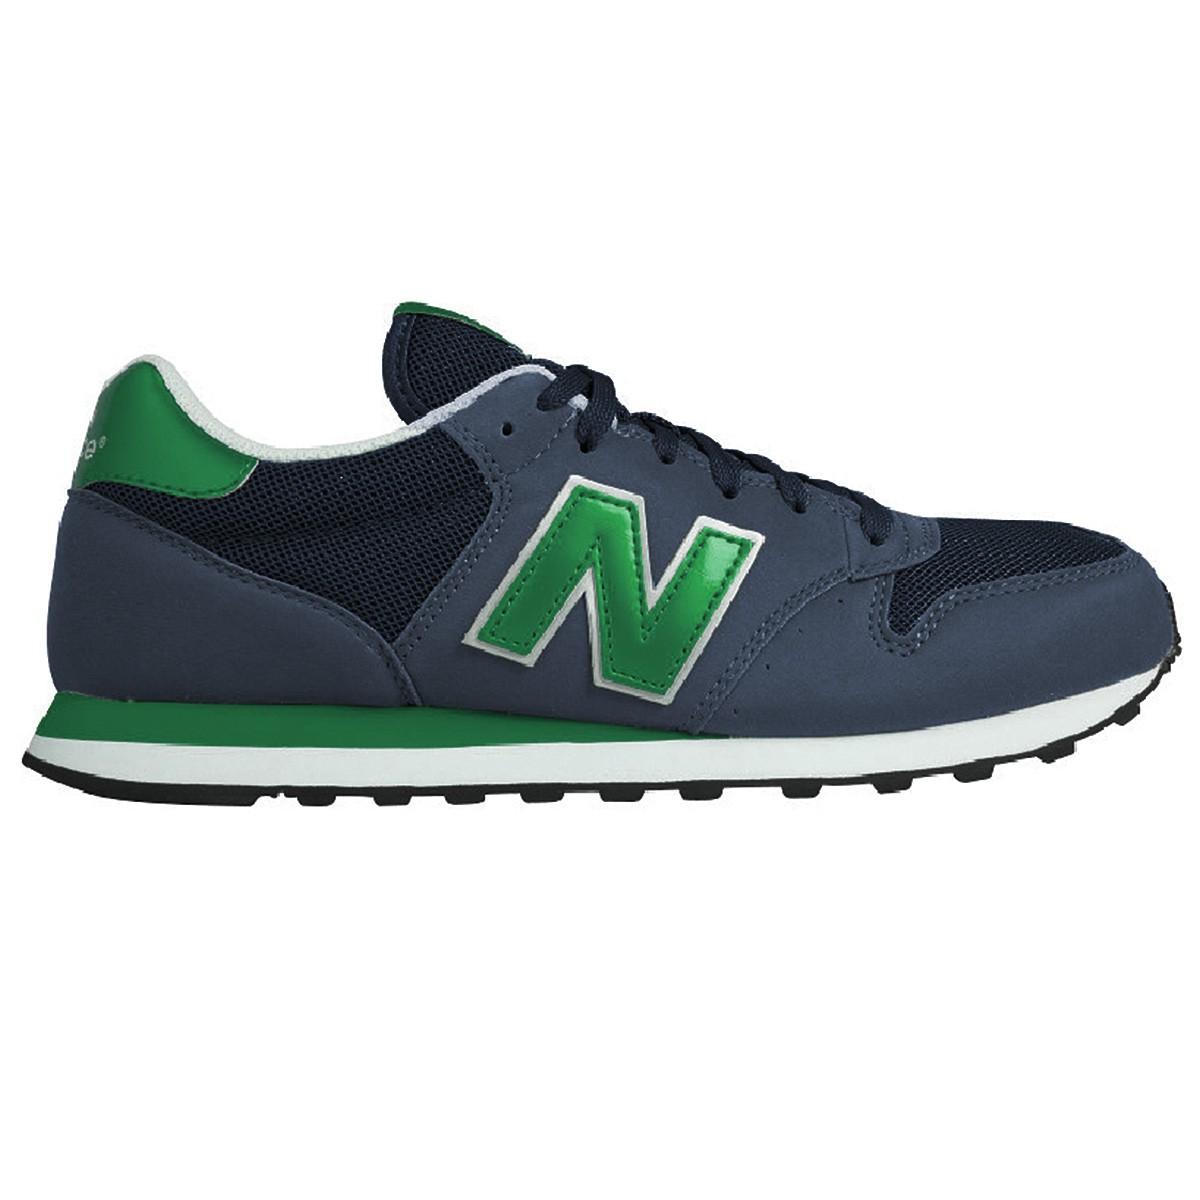 new balance 500 uomo verde